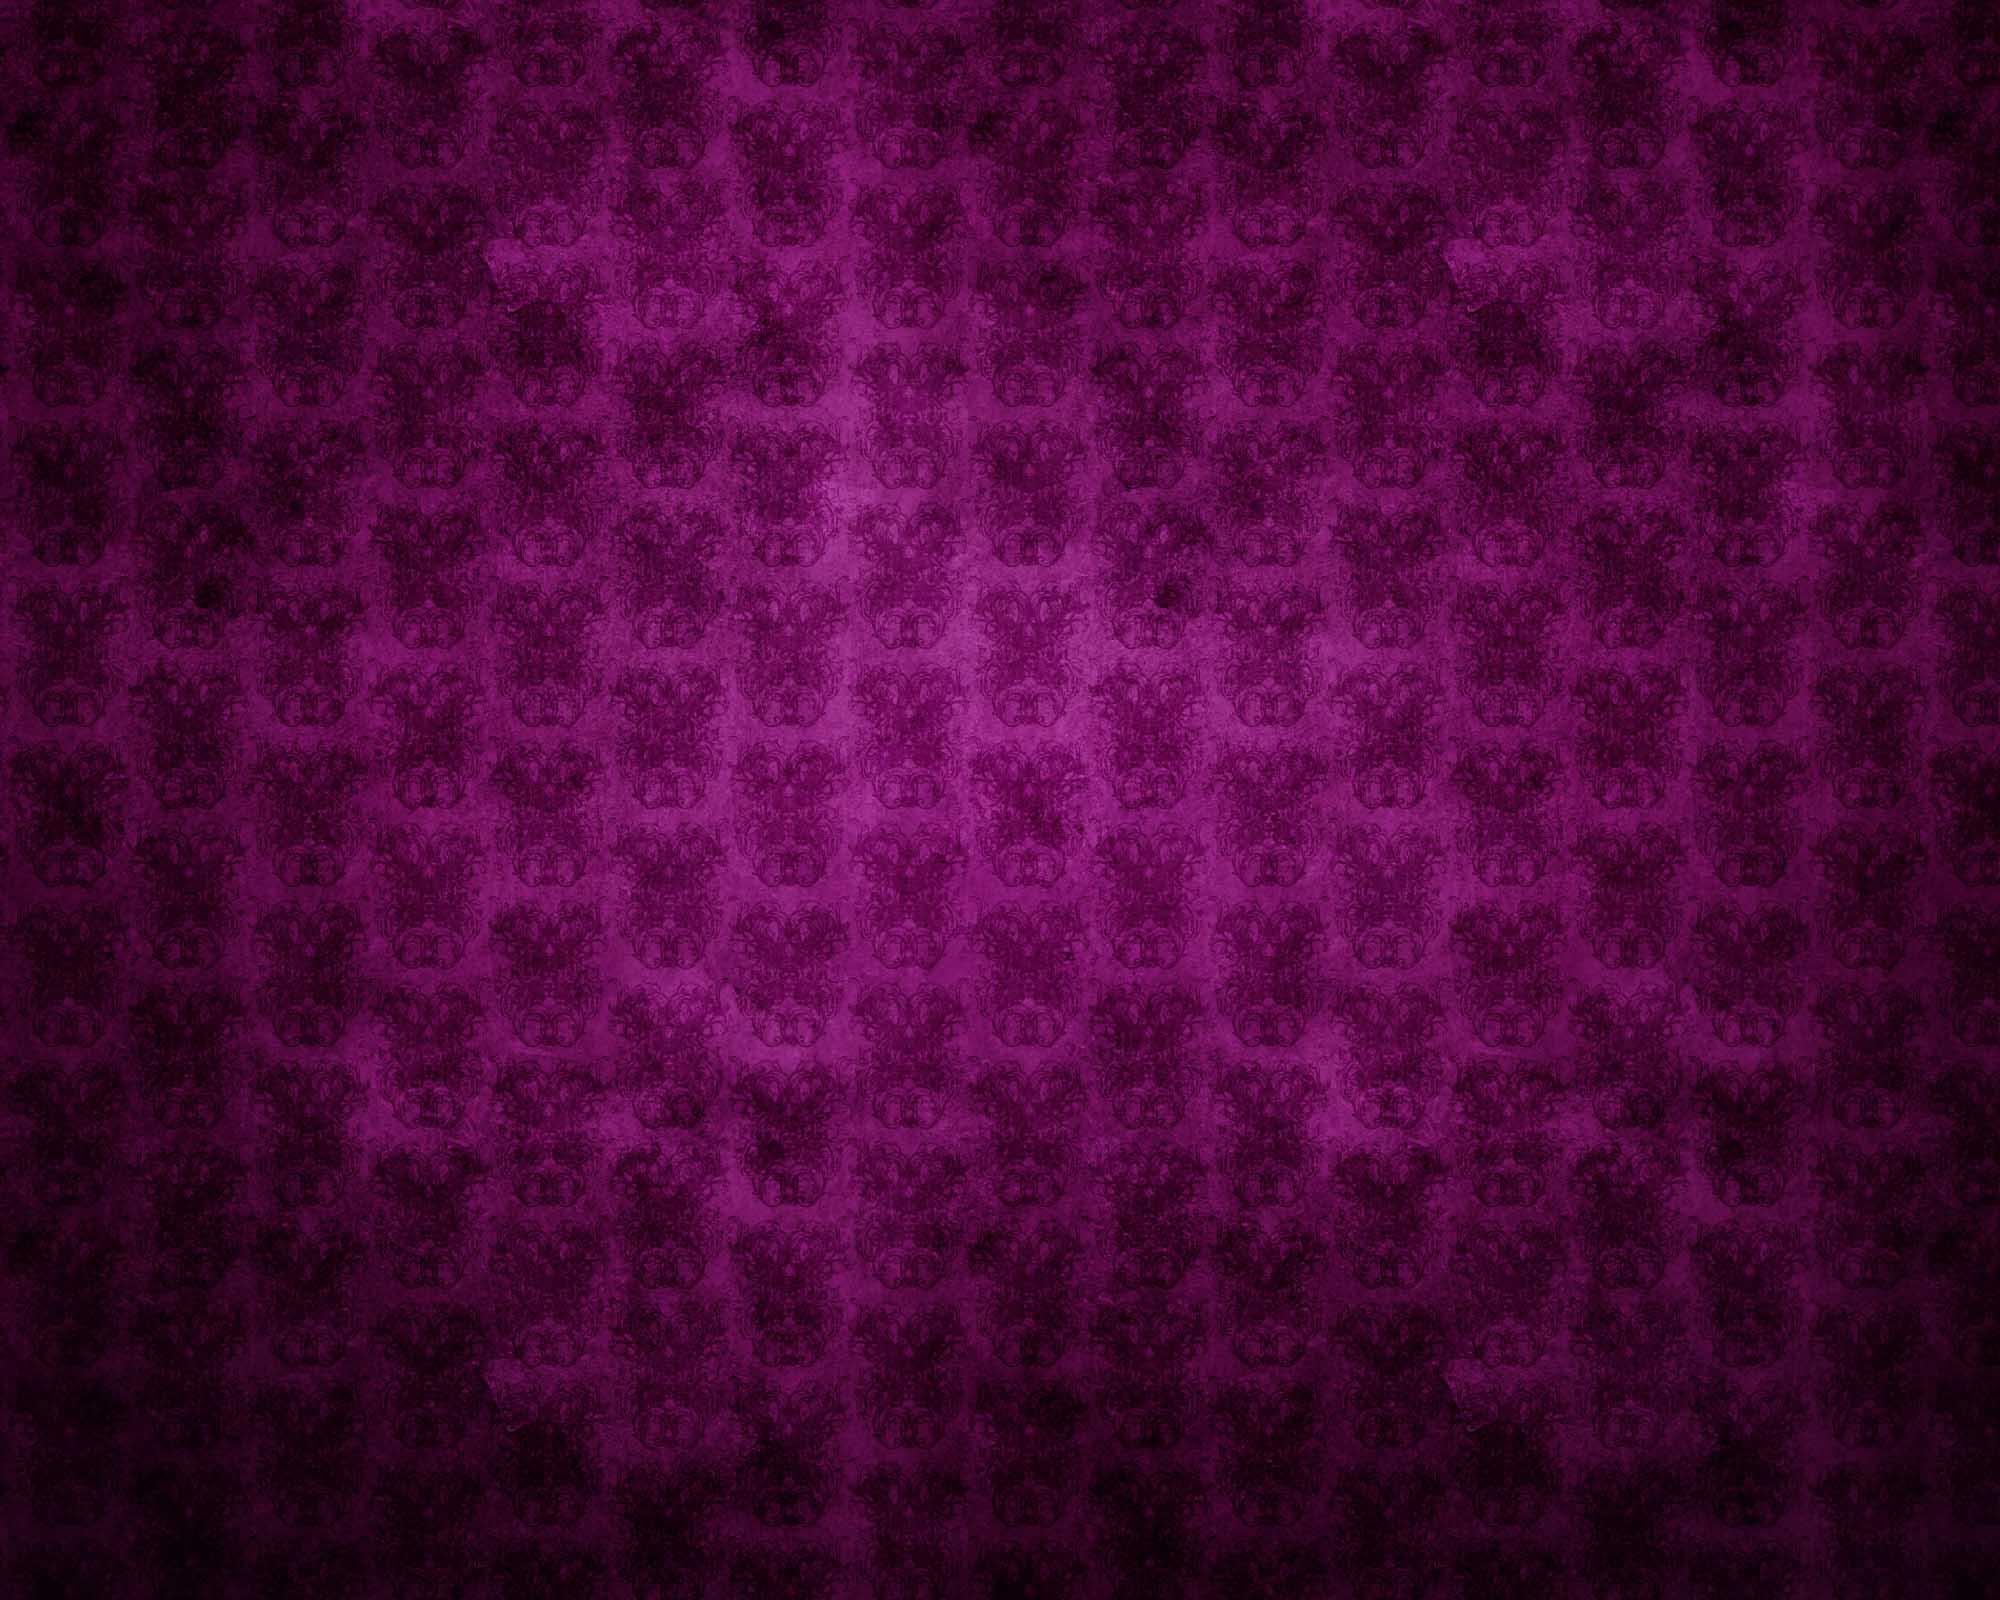 Purple Vintage Background 2000x1600